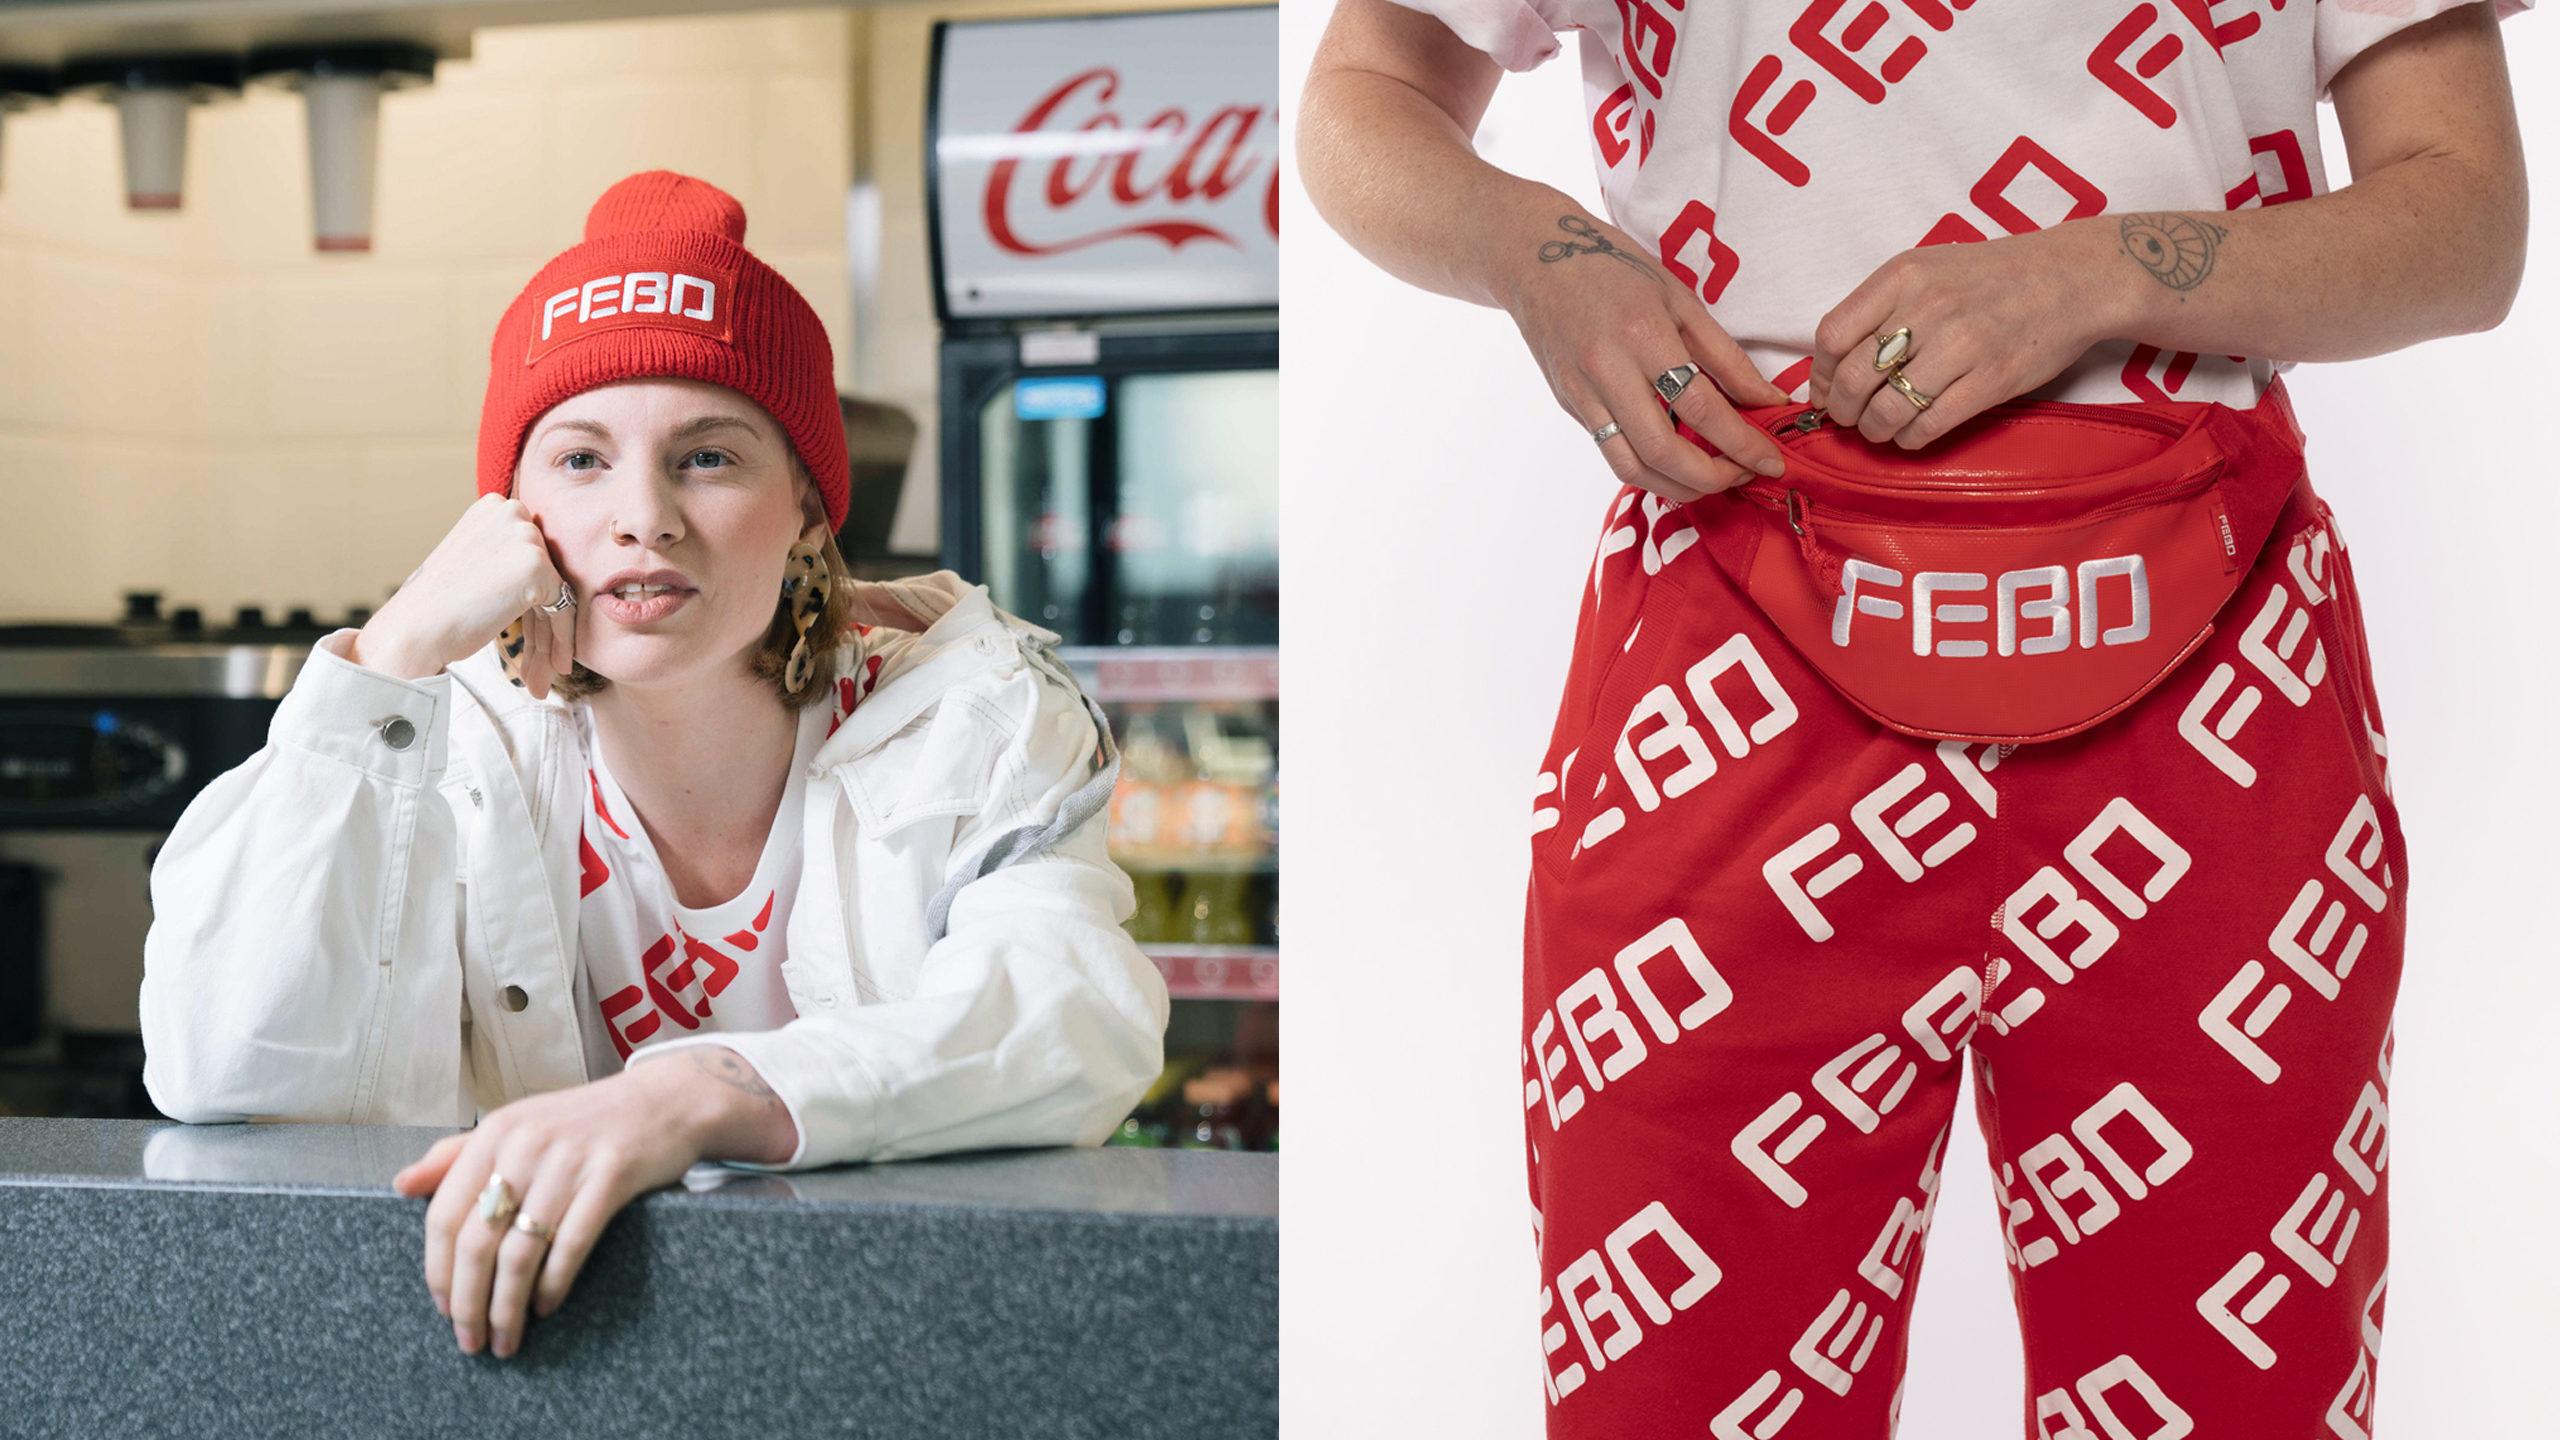 Case-febo-merchandise-webshop-dutchgiraffe-producten02